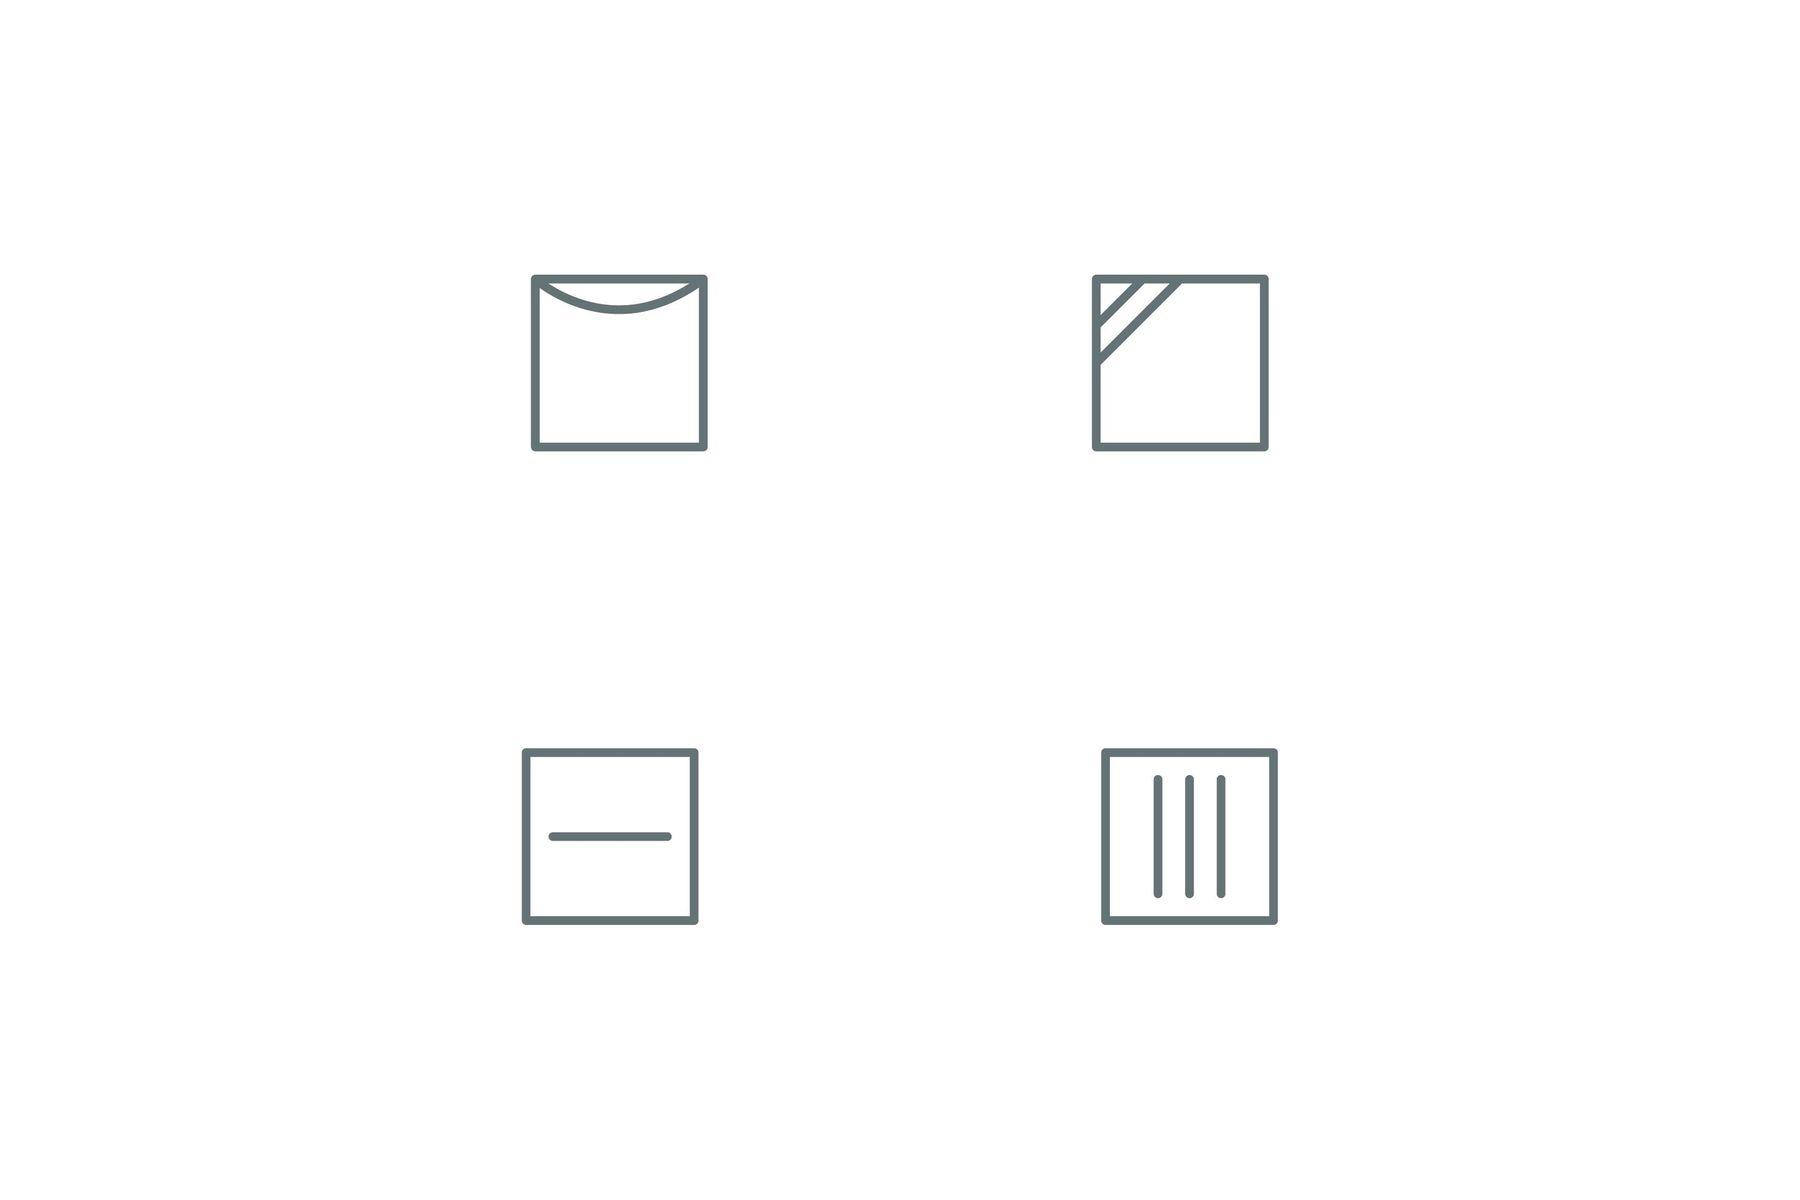 Line drying symbols